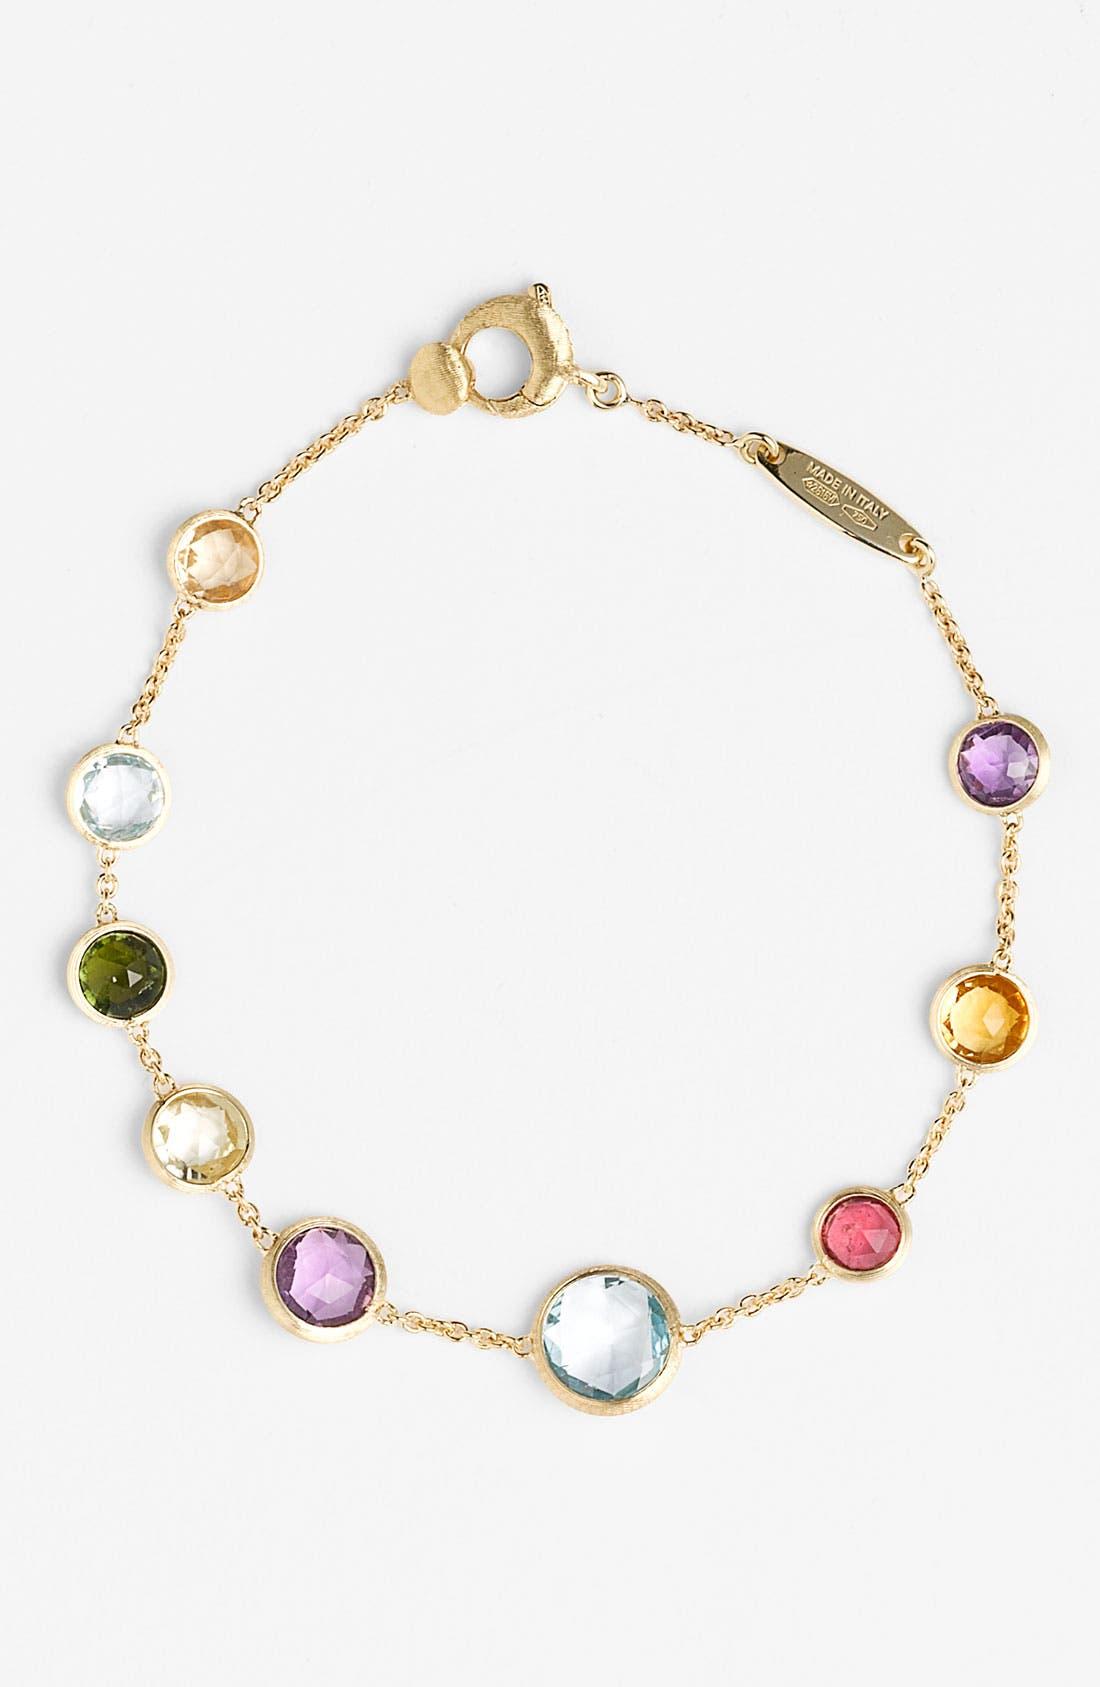 Alternate Image 1 Selected - Marco Bicego 'Mini Jaipur' Single Strand Bracelet